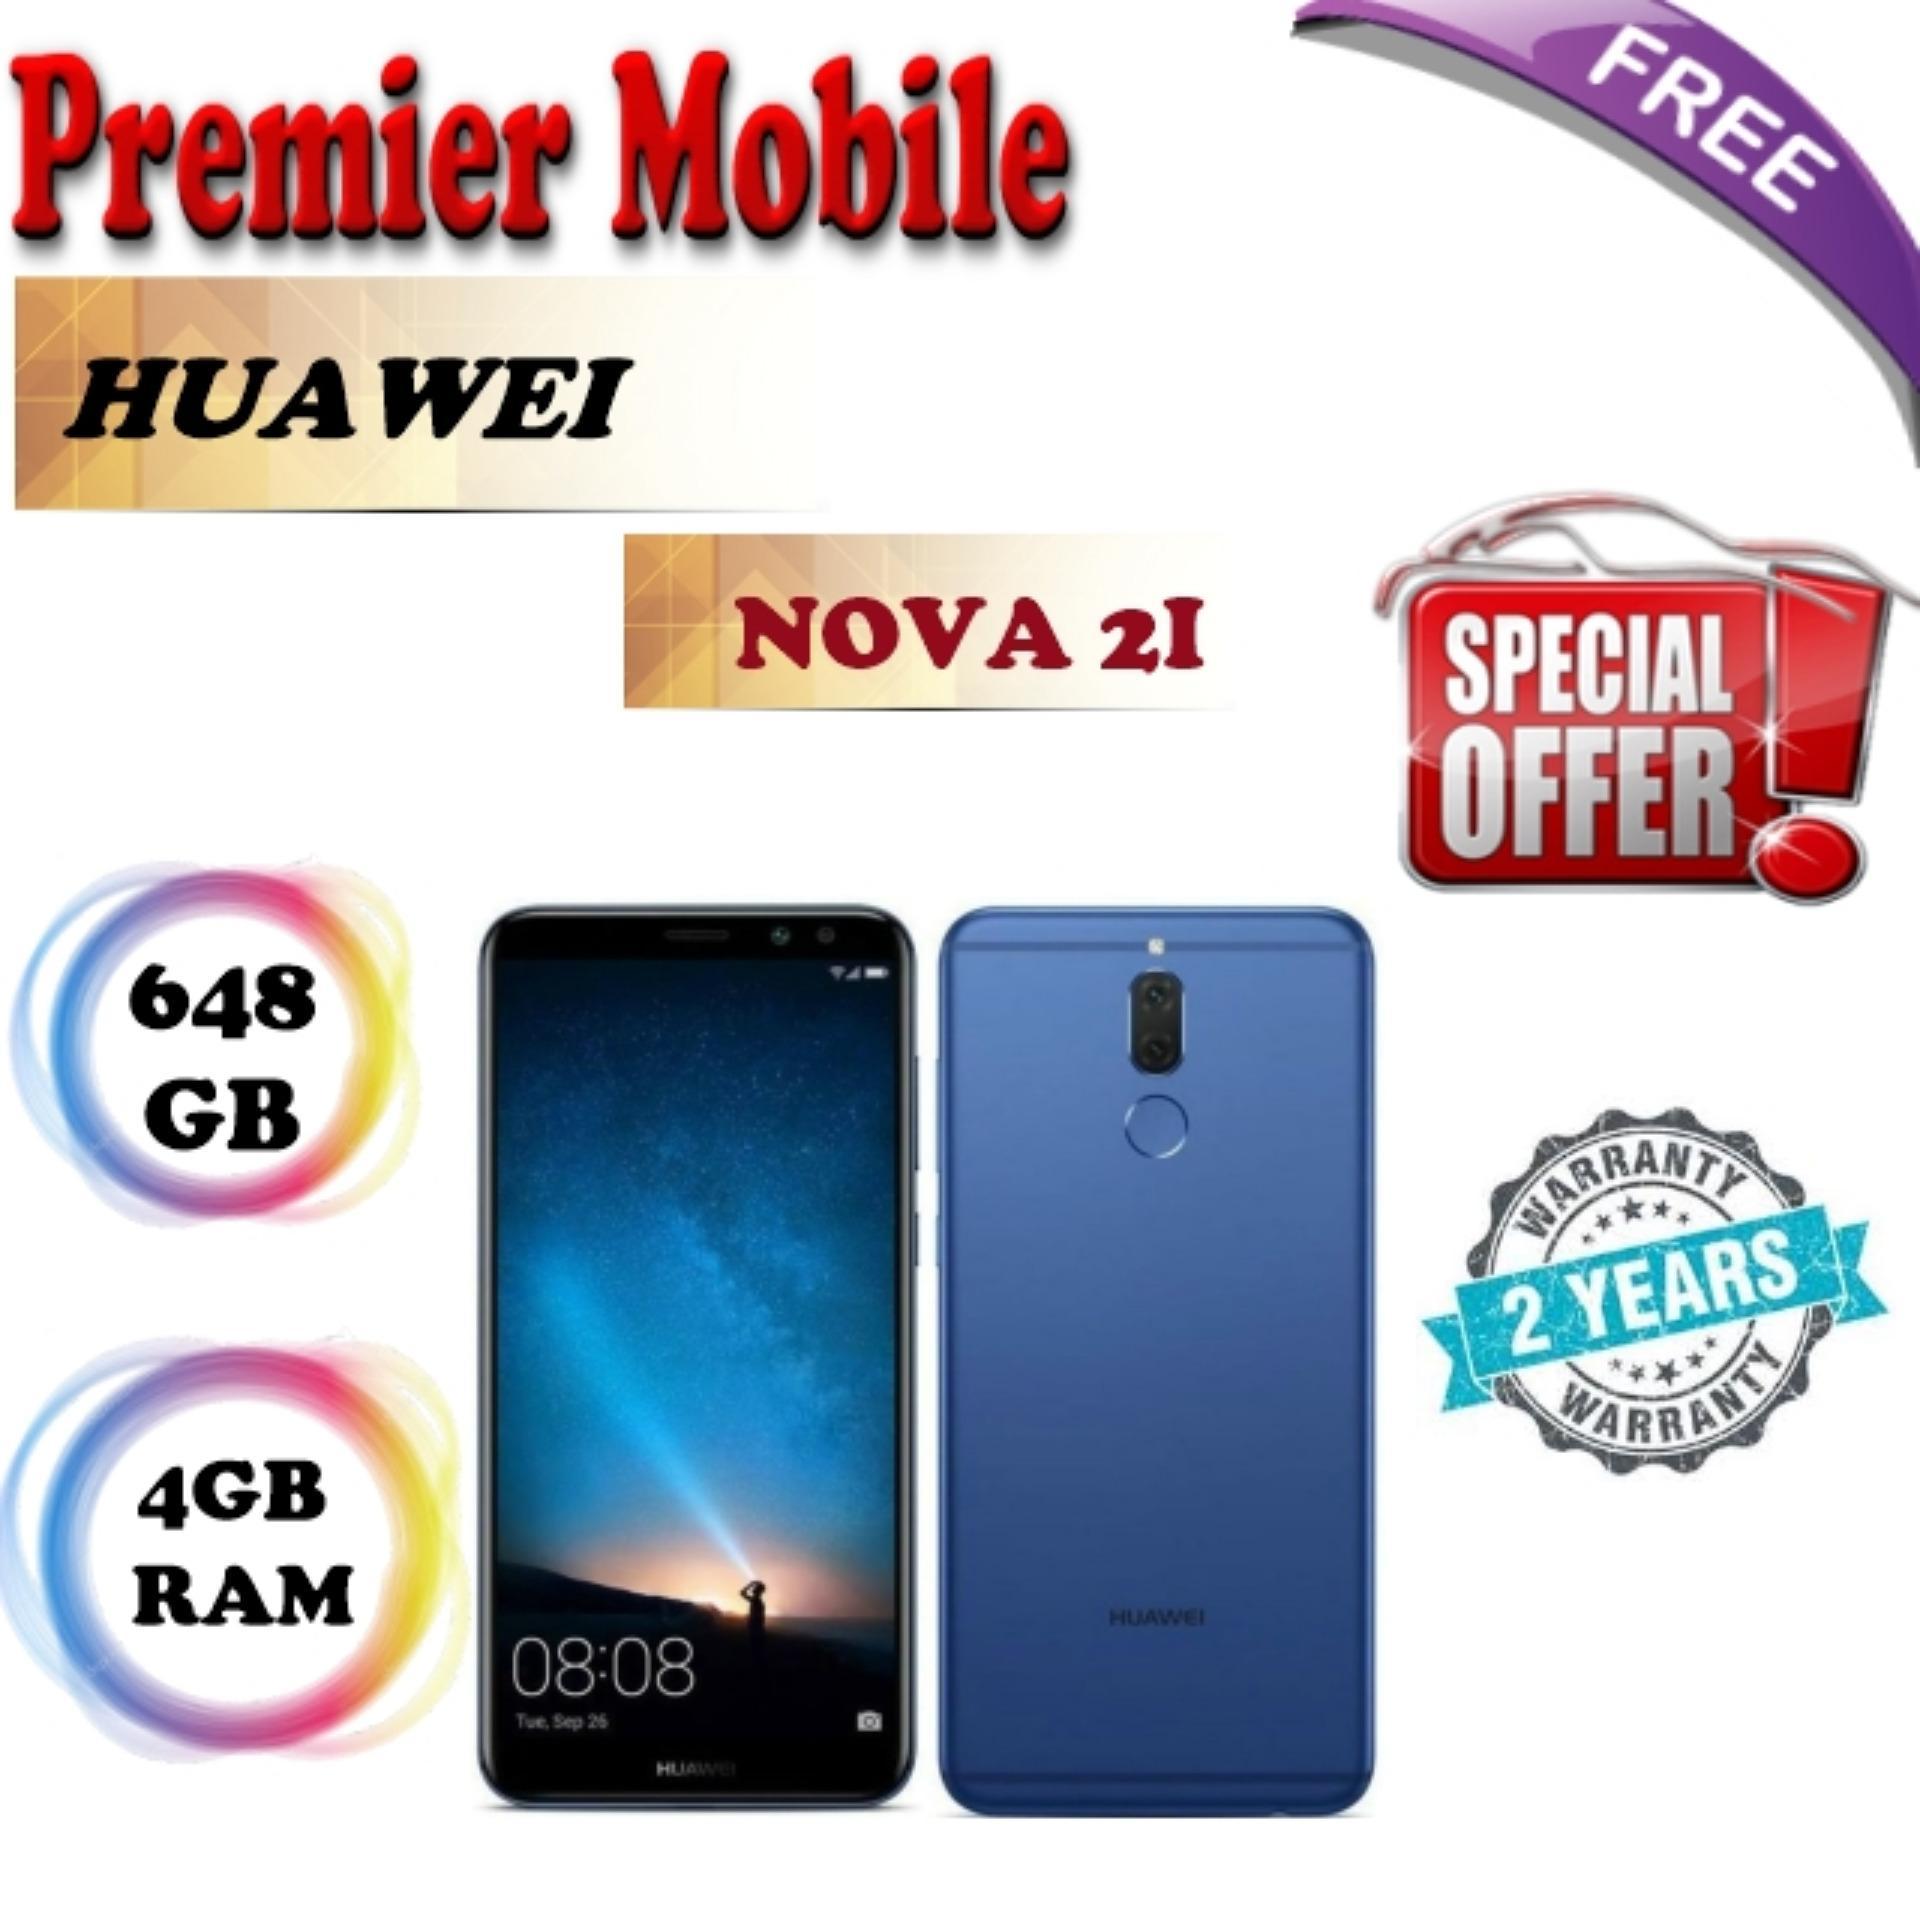 Huawei Nova 2I For Sale Online